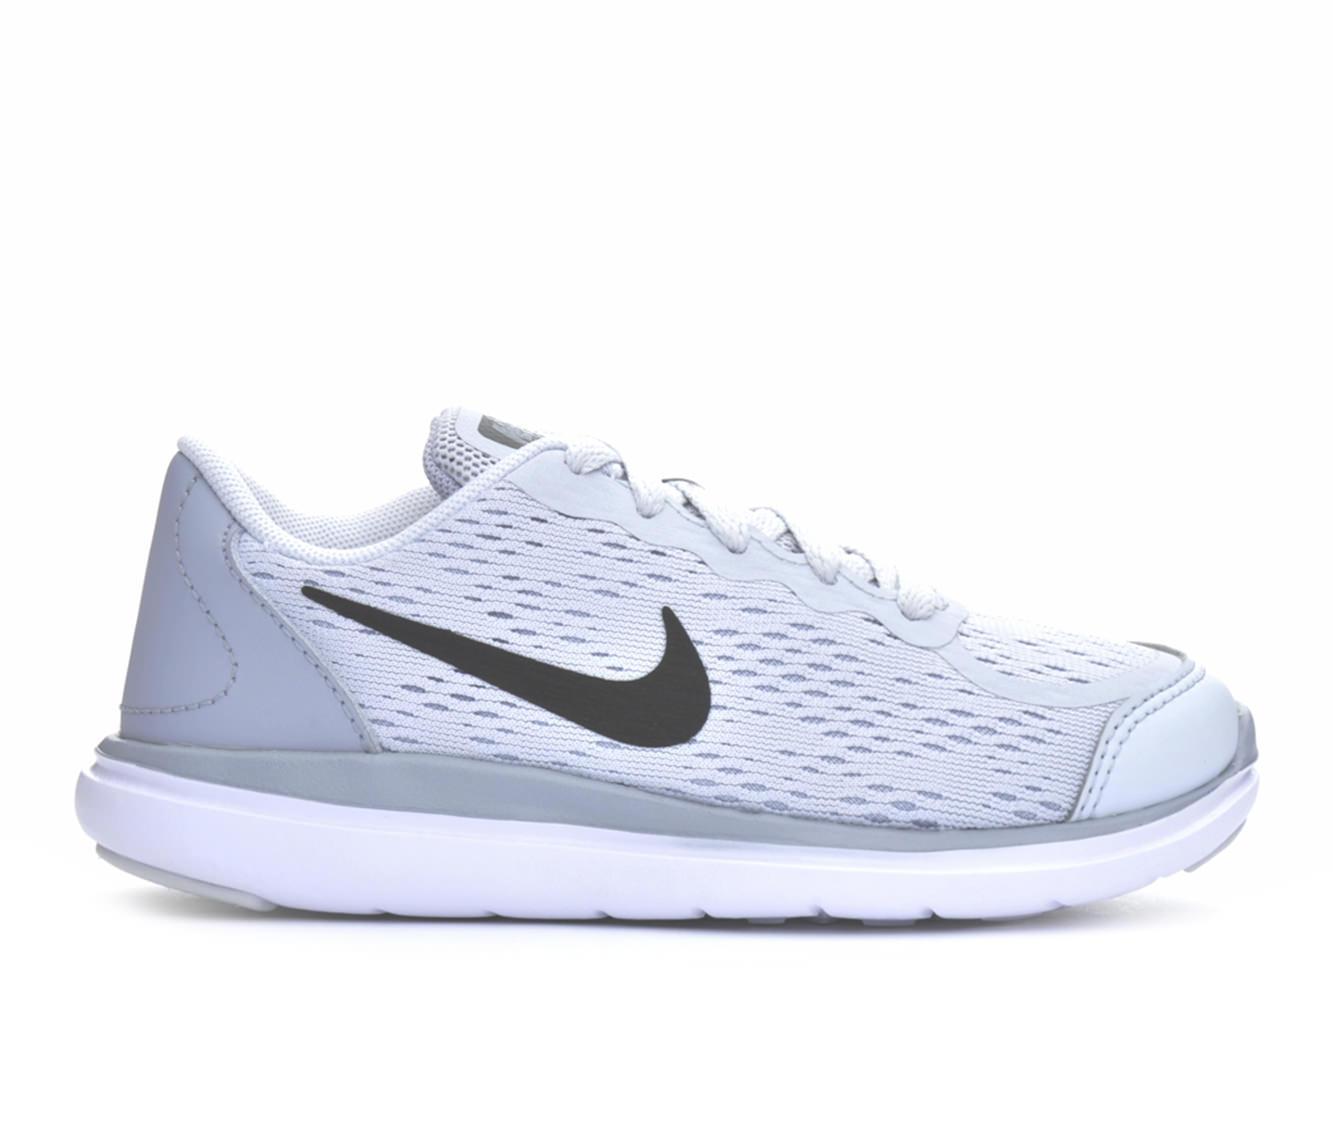 Girls' Nike Flex RN 10.5 - 3 Running Shoes (Silver)